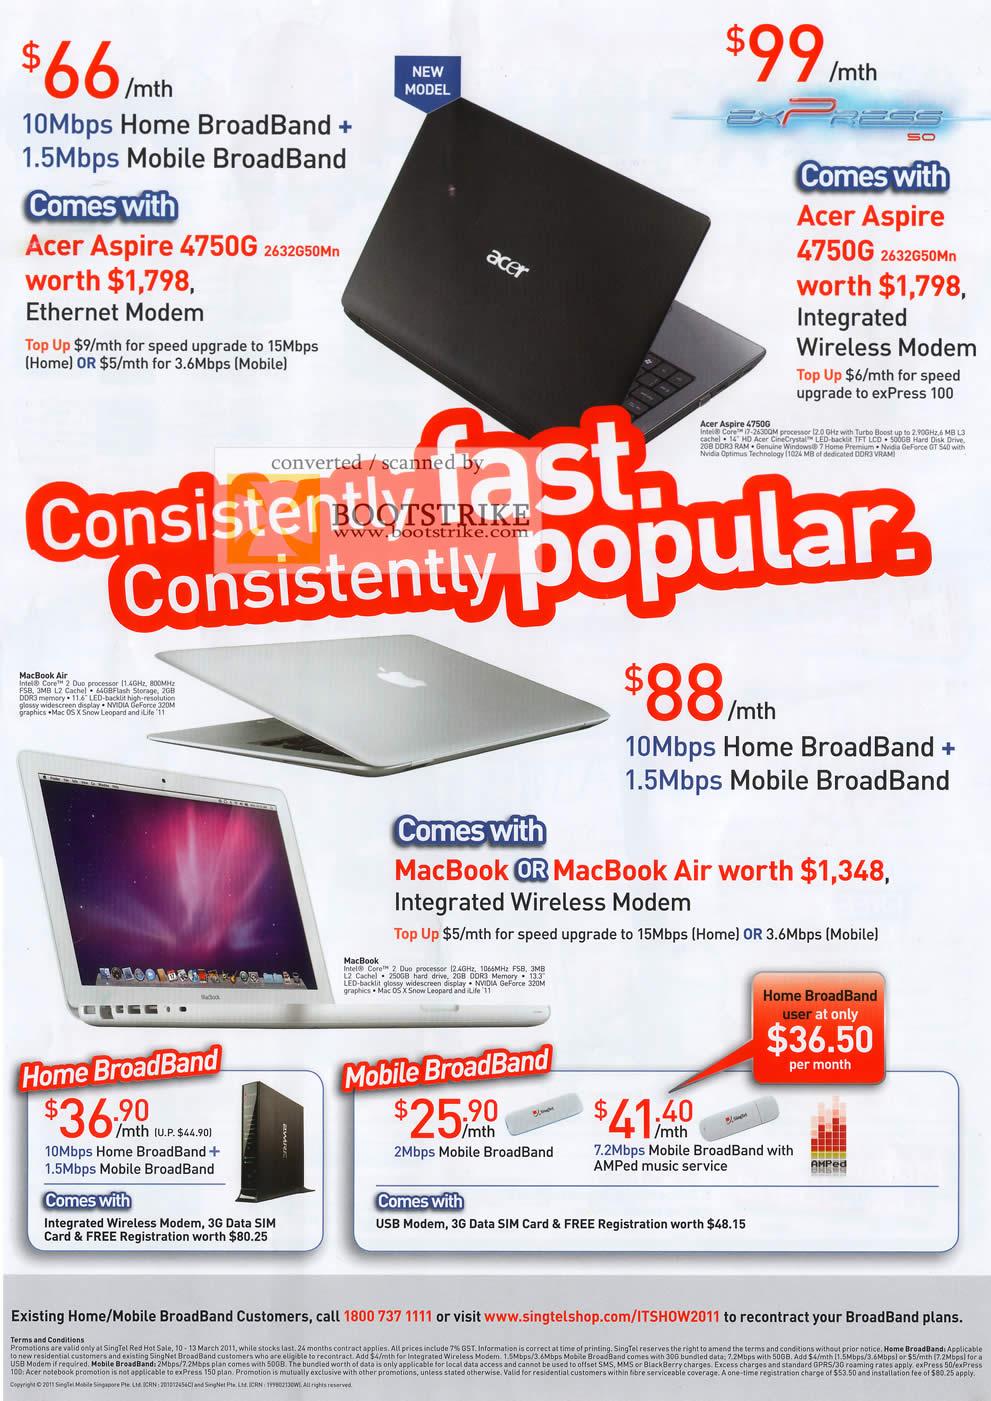 IT Show 2011 price list image brochure of Singtel Acer Aspire 4750G Home Broadband Mobile MacBook Air 10Mbps